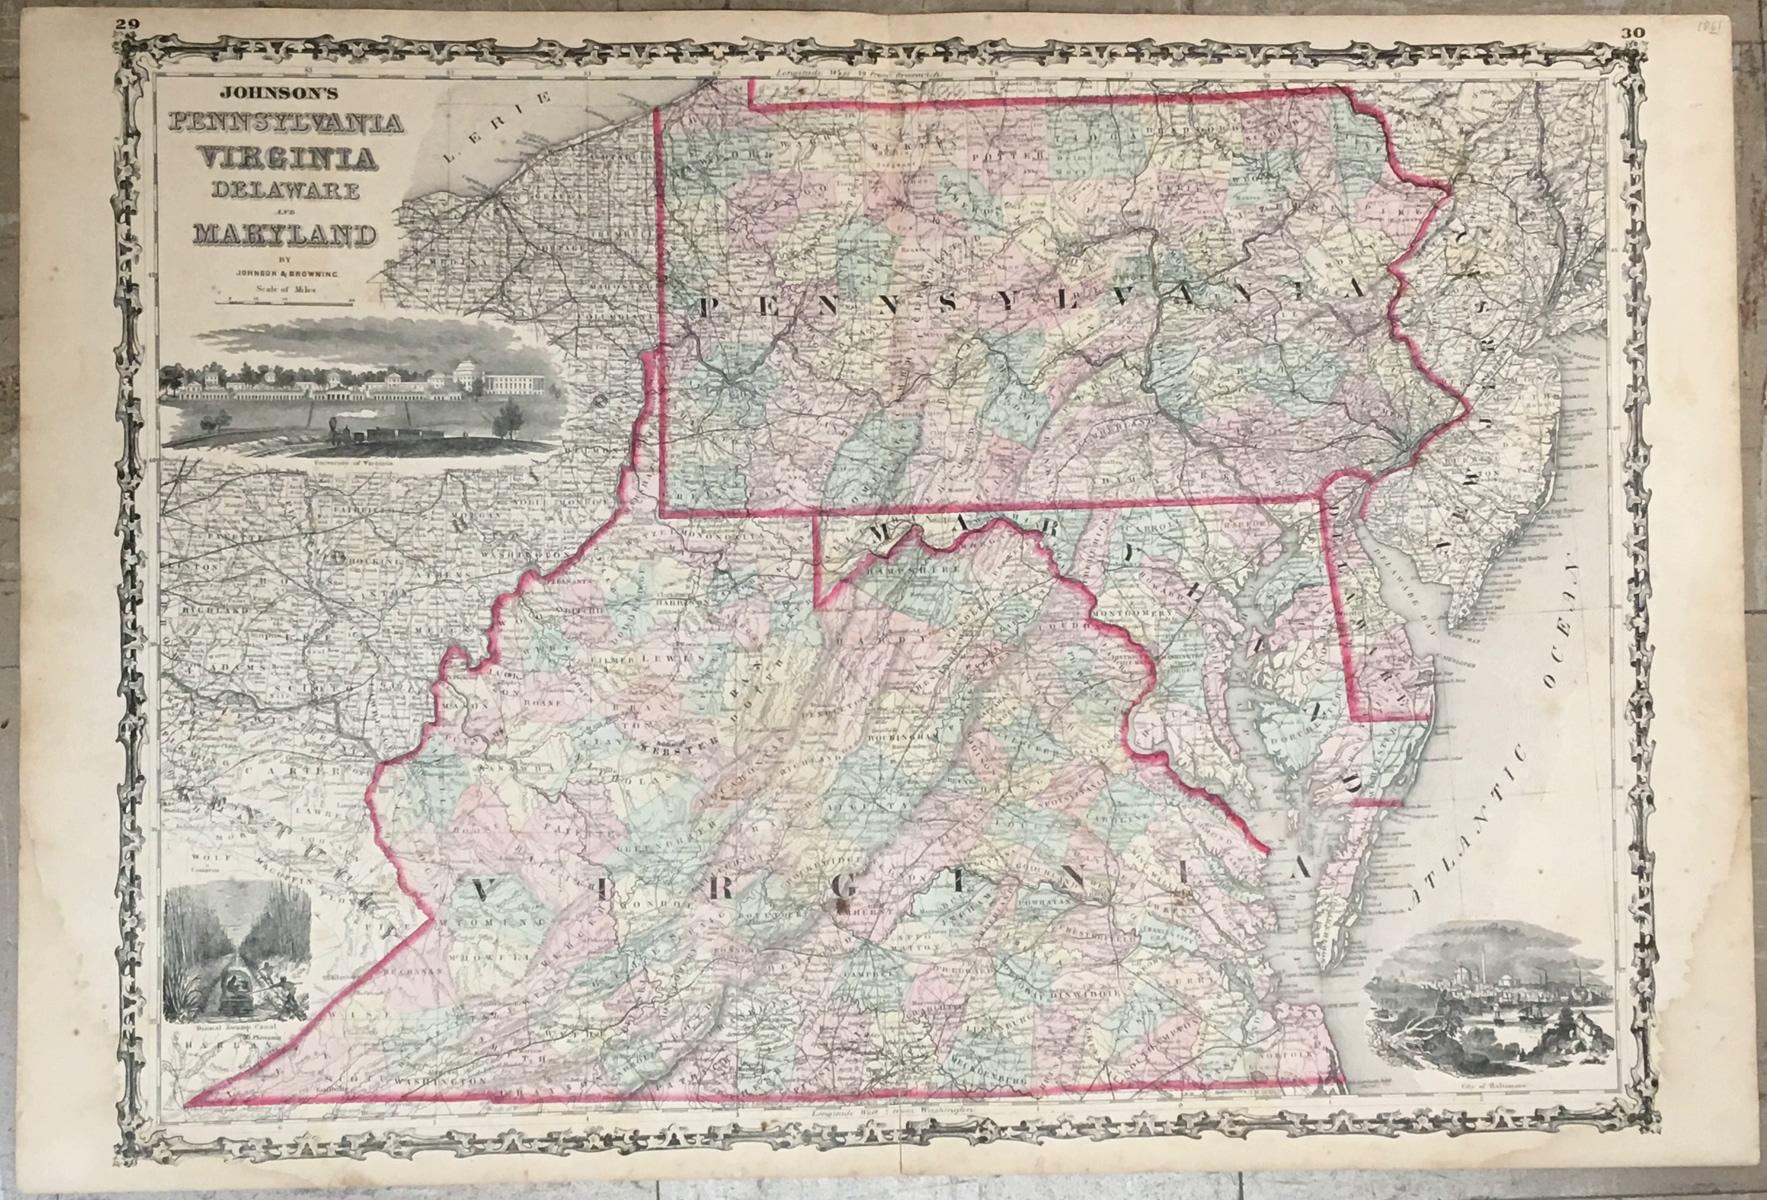 Maps Antique United States US States Delaware